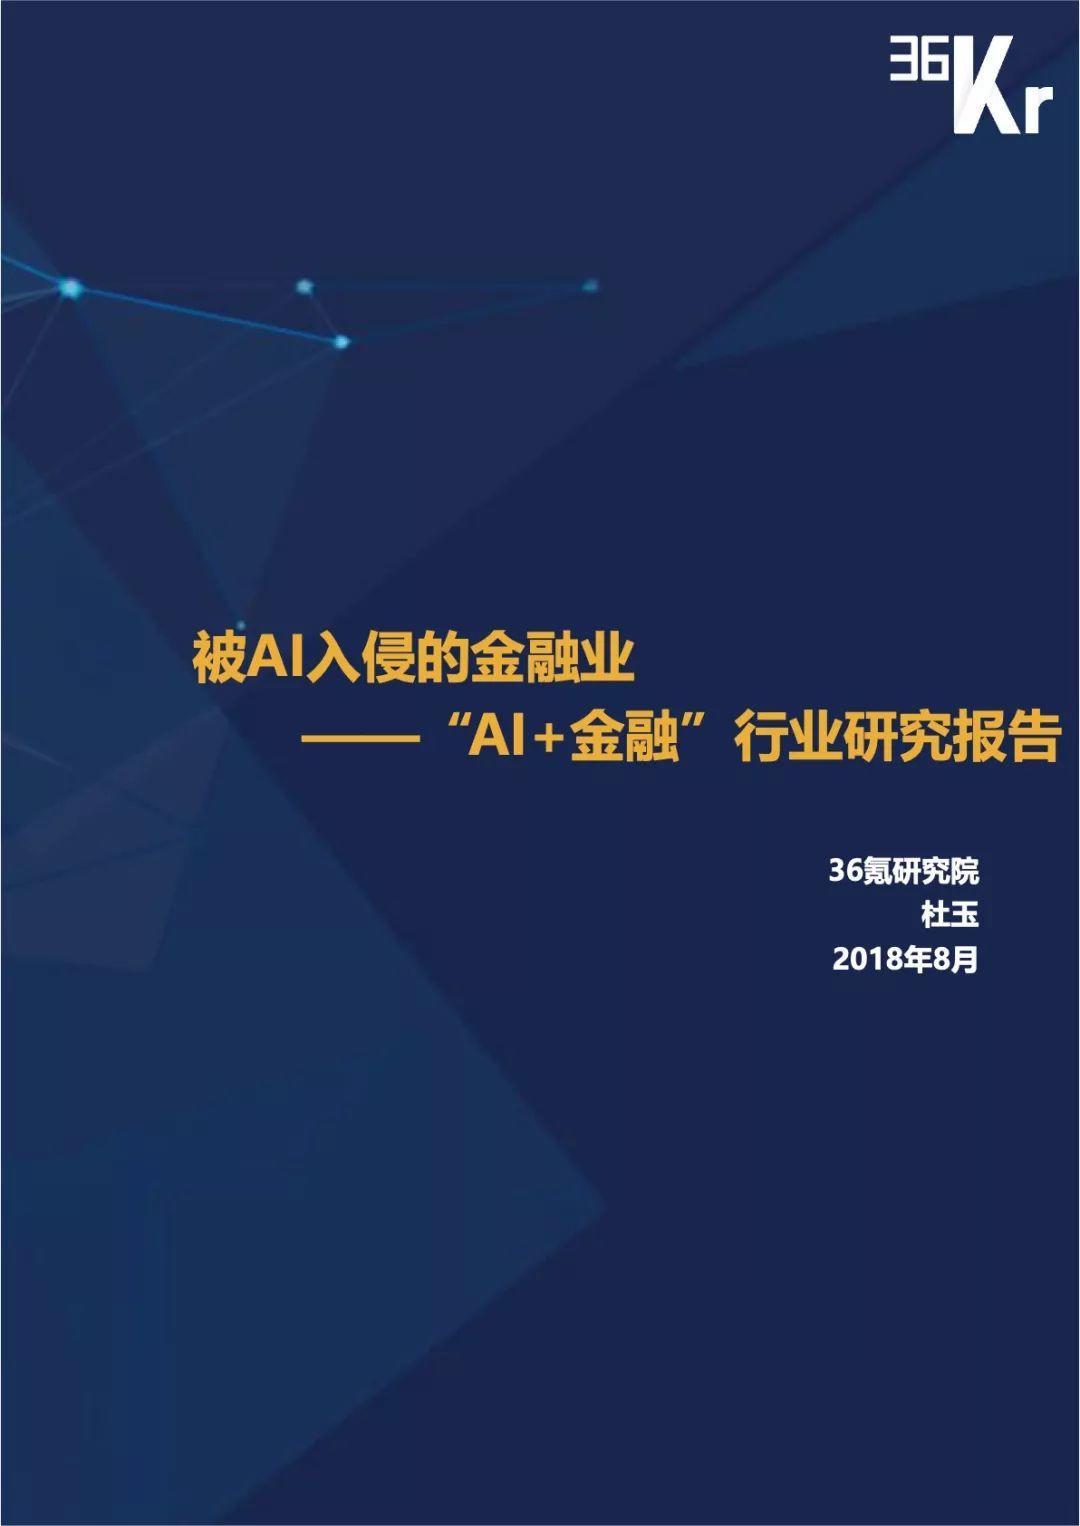 36Kr:AI+金融行业报告